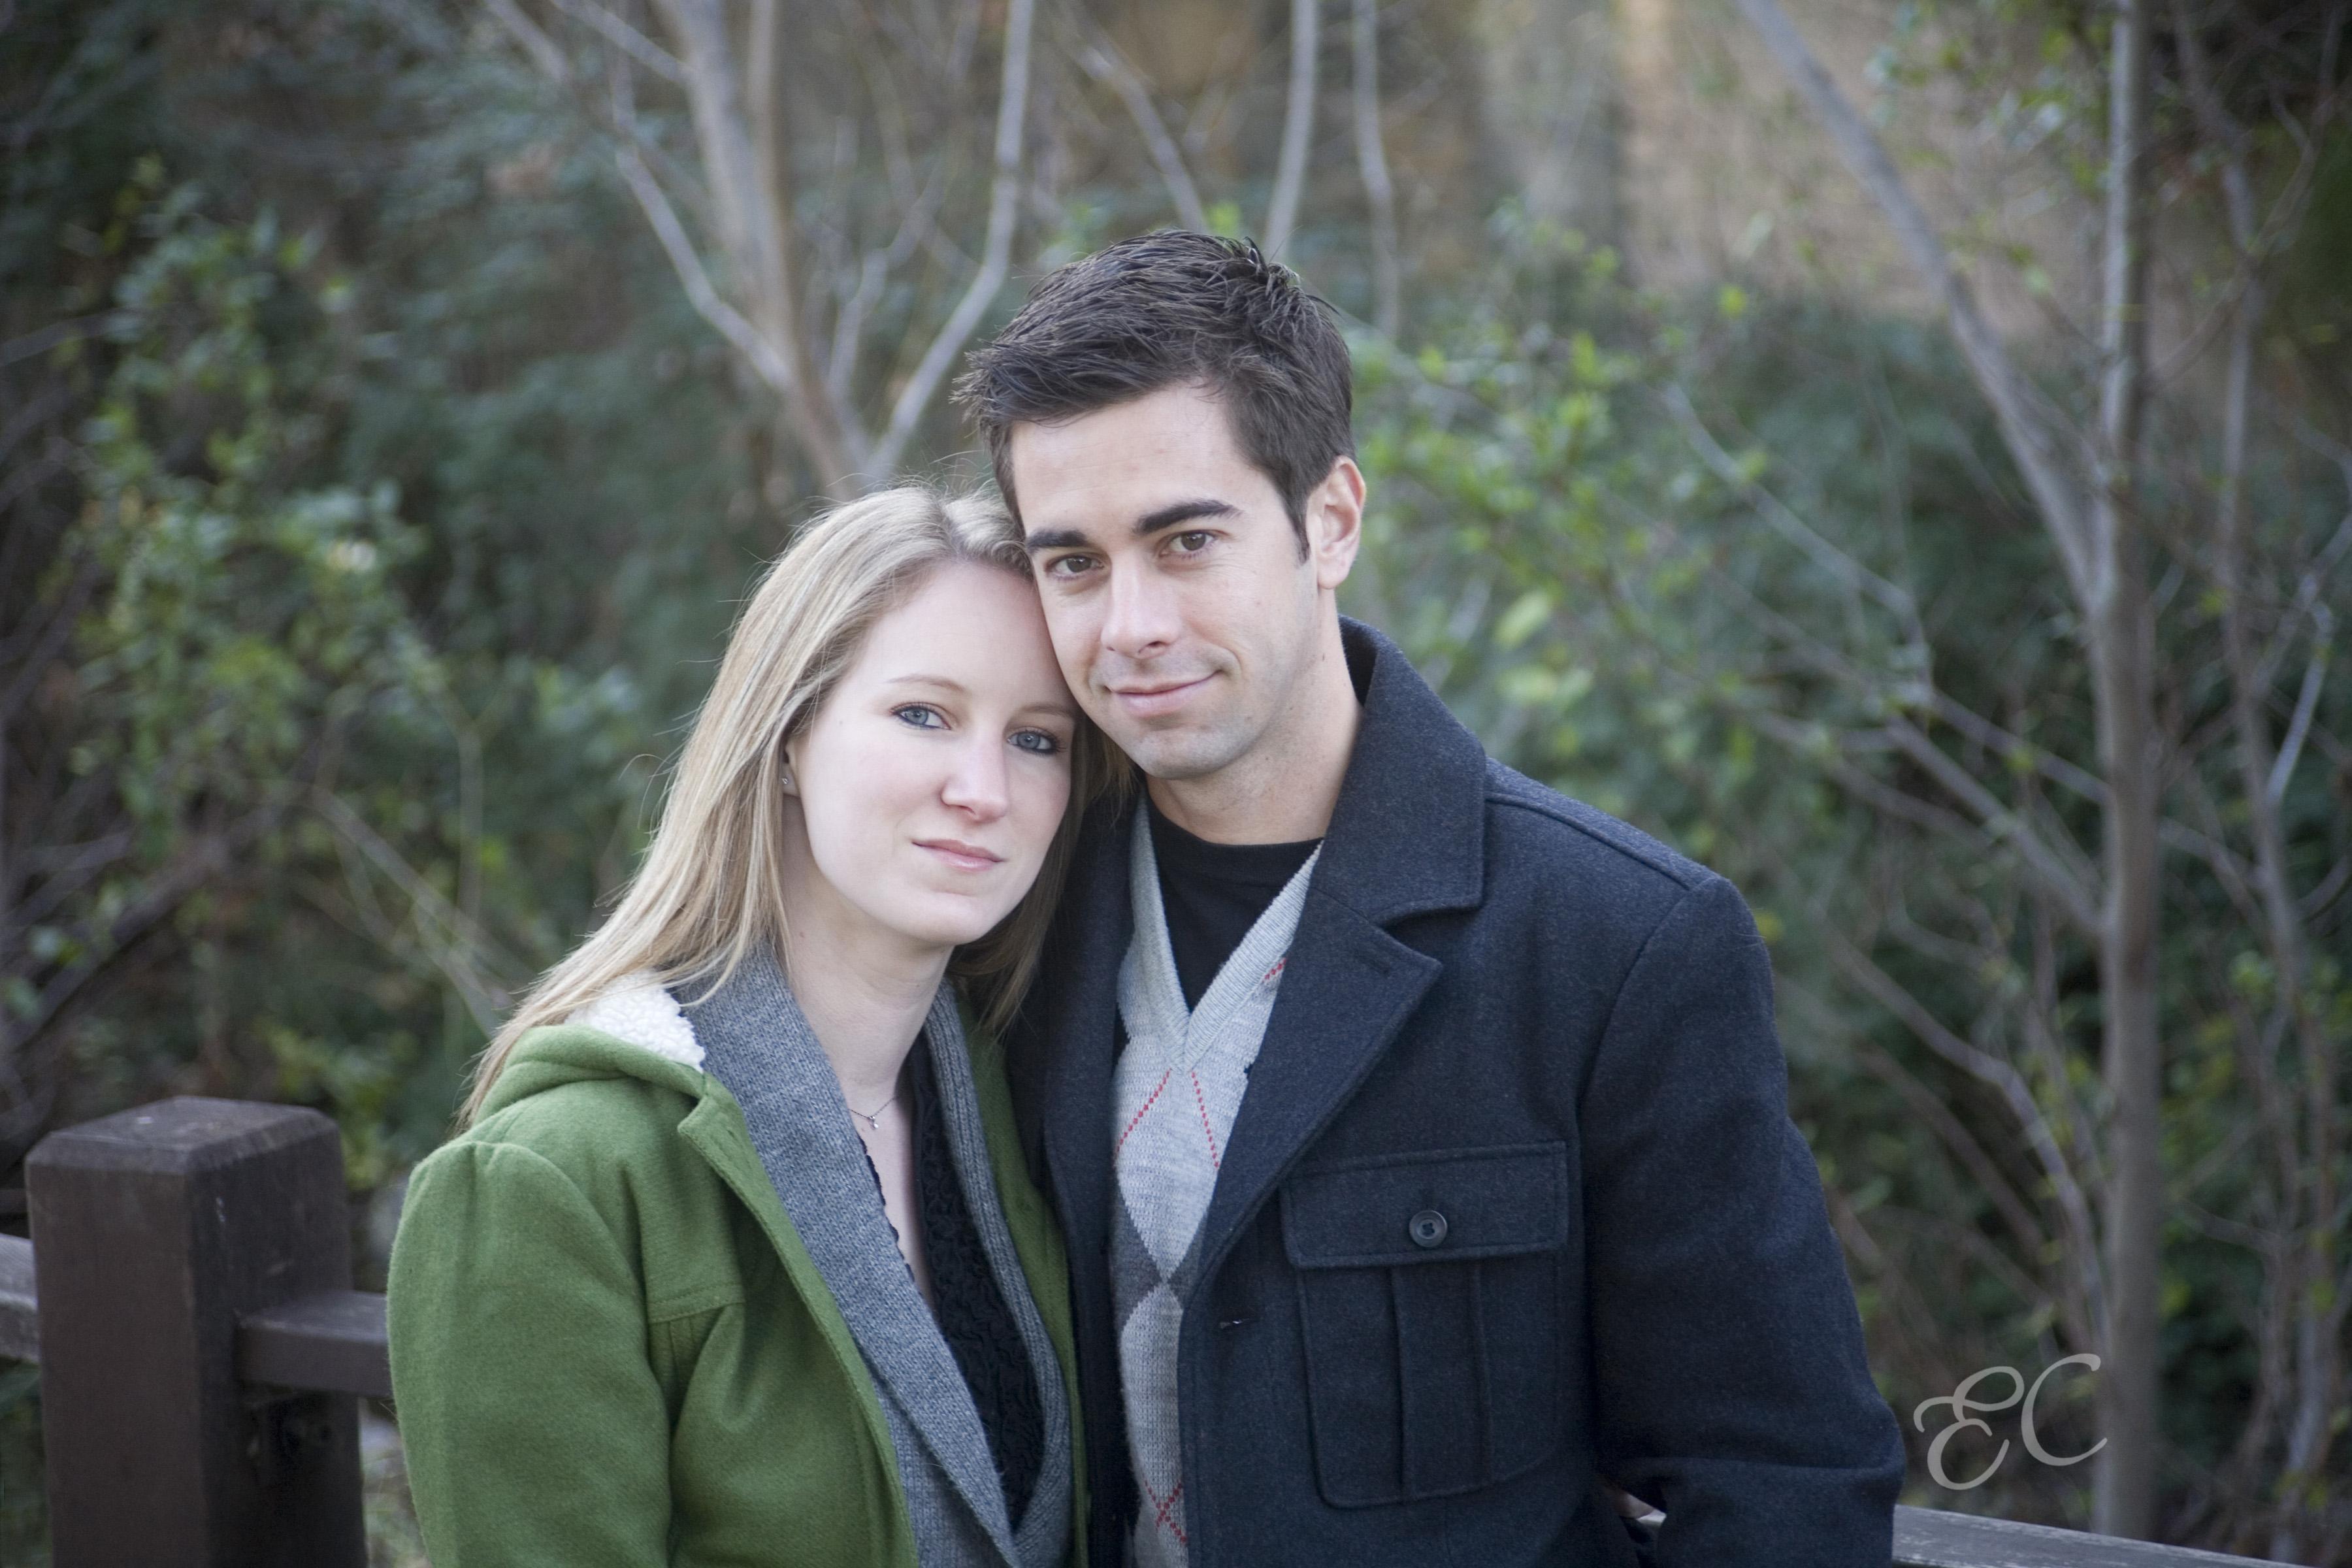 engagement portrait couple winter woman blonde man brown hair outdoor